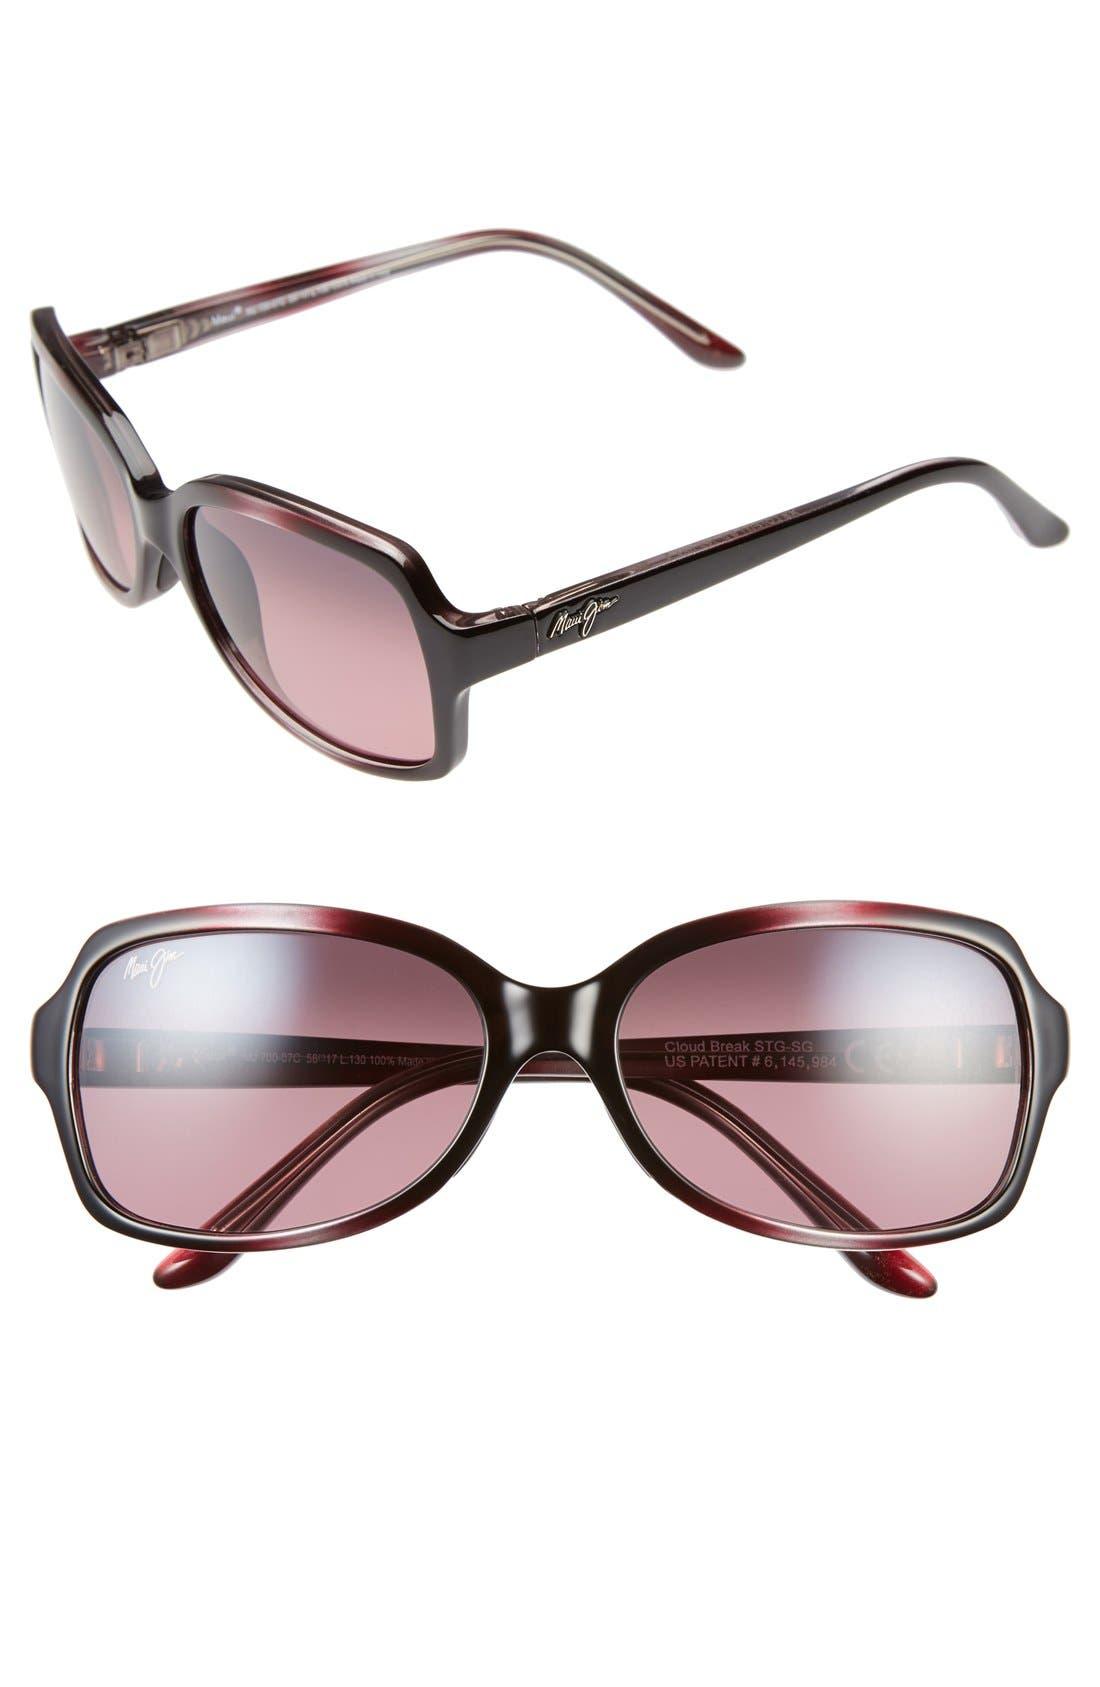 Maui Jim Cloud Break 56mm PolarizedPlus2® Sunglasses